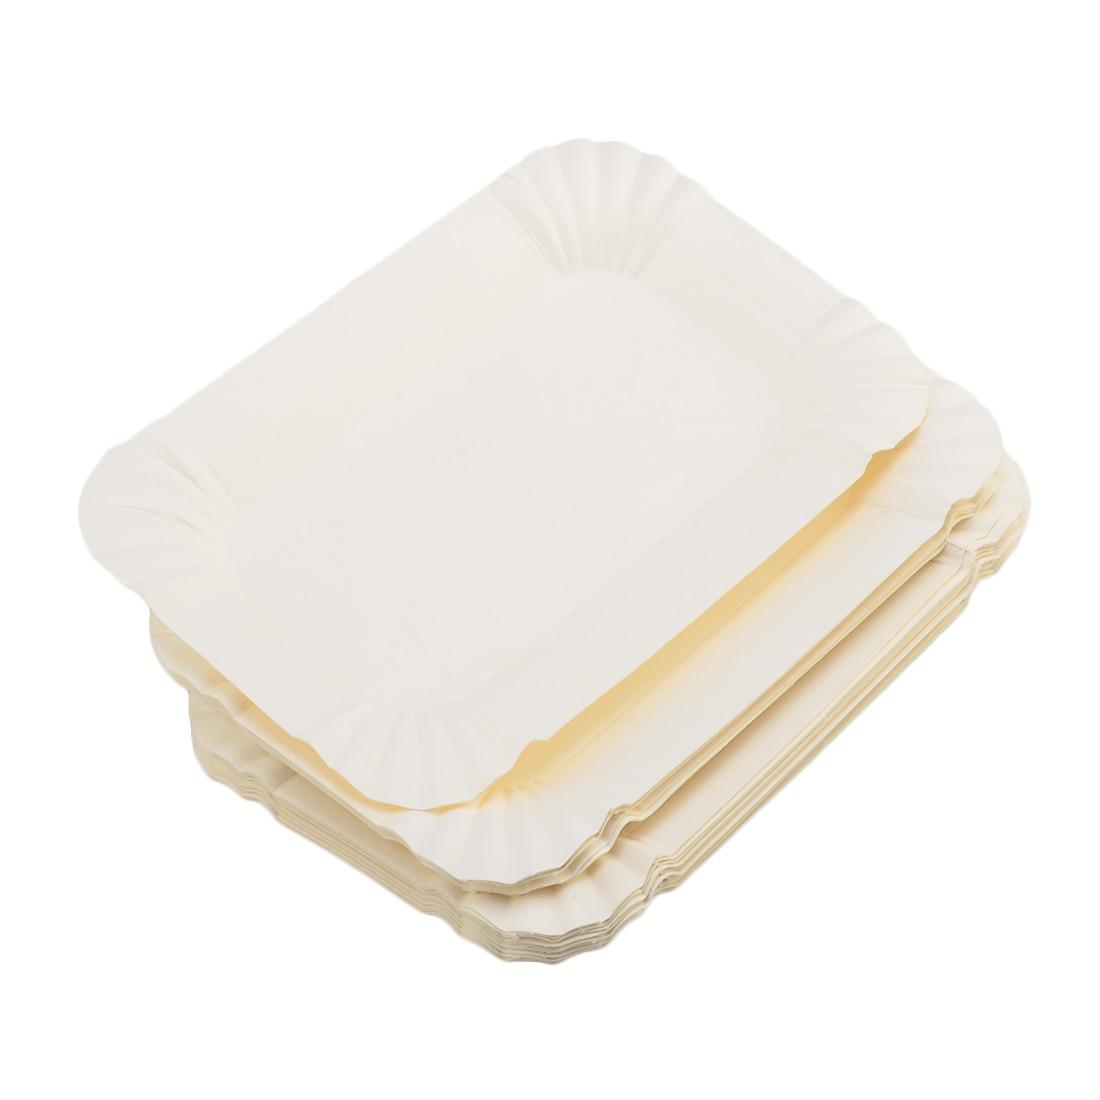 20Pcs Disposable Rectangular Dinnerware Paper Plates and 200Pcs Natural Bamboo BBQ Skewers Roasting Sticks Barbecue Tool  sc 1 st  AliExpress.com & Hot sale 20Pcs Disposable paper plates Rectangular Dinnerware Paper ...